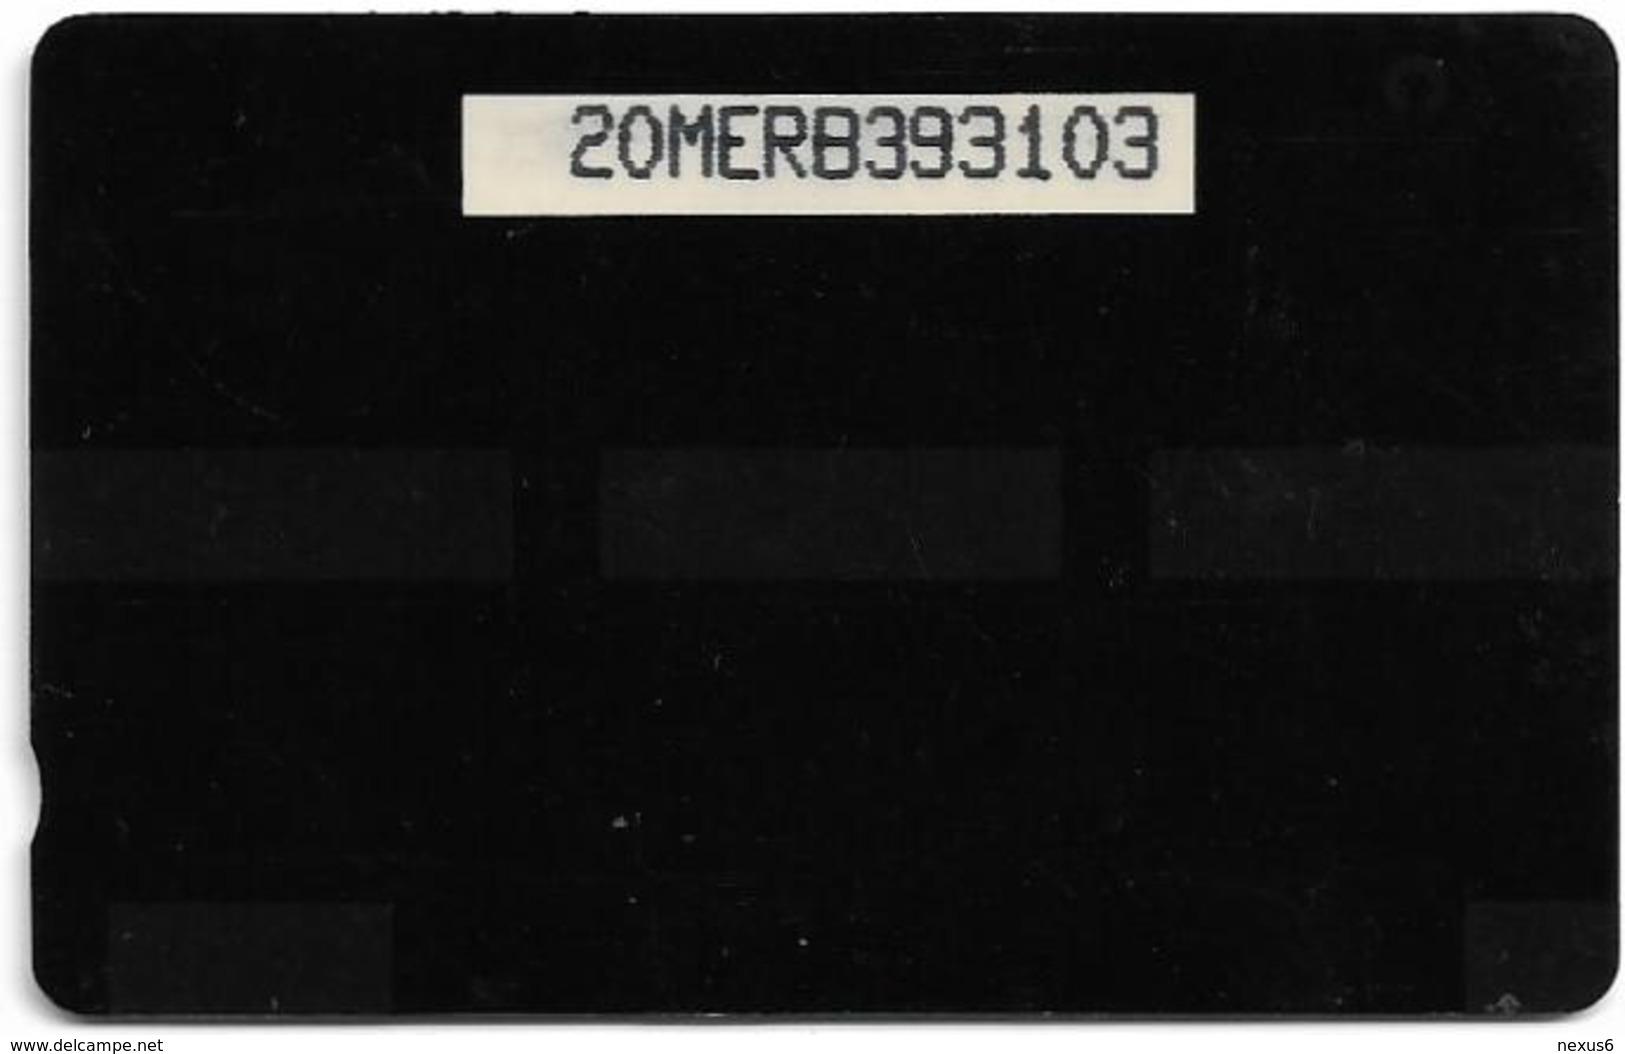 UK (Mercury) - A Few Dollars More, 20MERB - MER261, 3.196ex, Used - Reino Unido